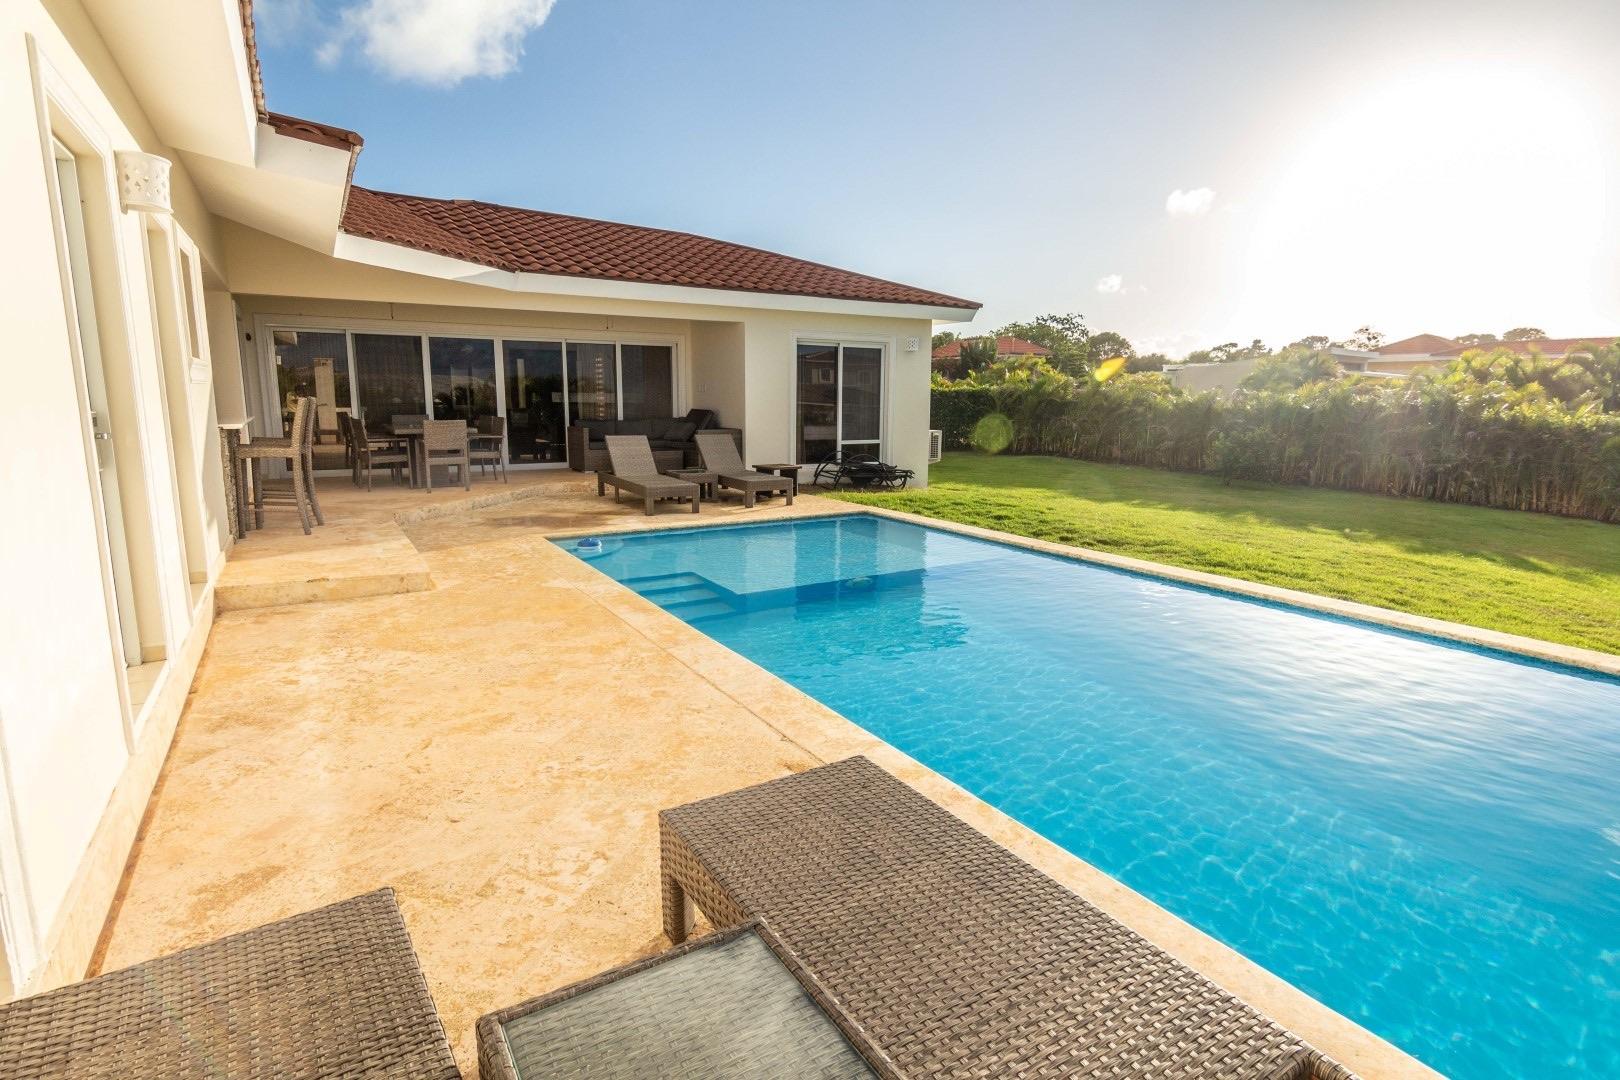 3 Bedroom Rental Sosua Villa With Lap Pool